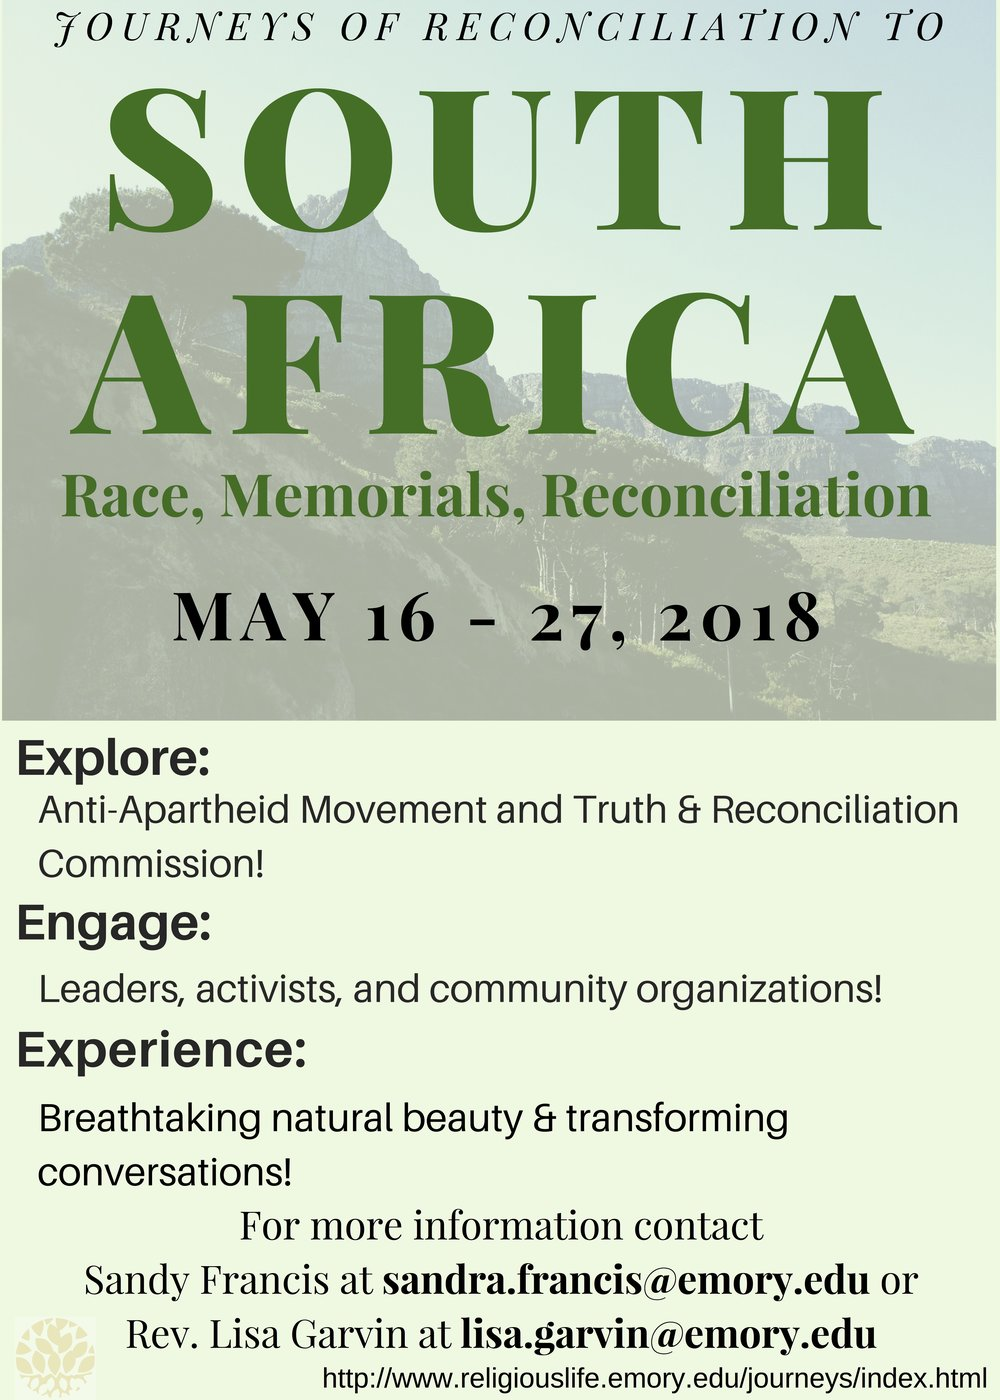 REVISED south africa journeys green-2.jpg